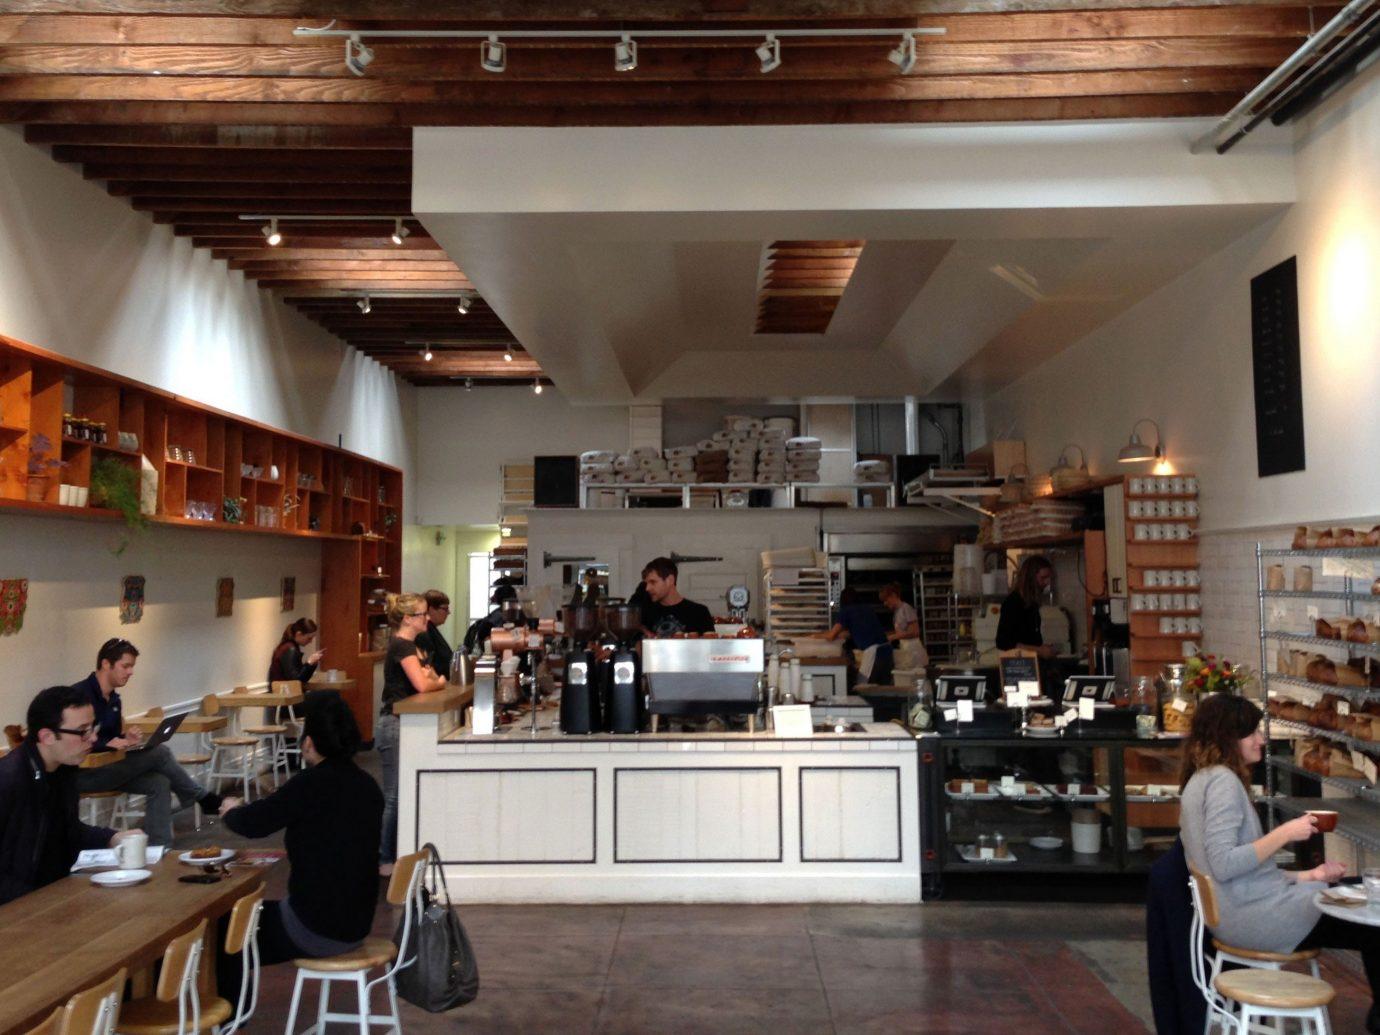 Food + Drink indoor ceiling floor Kitchen person restaurant interior design café Design Bar